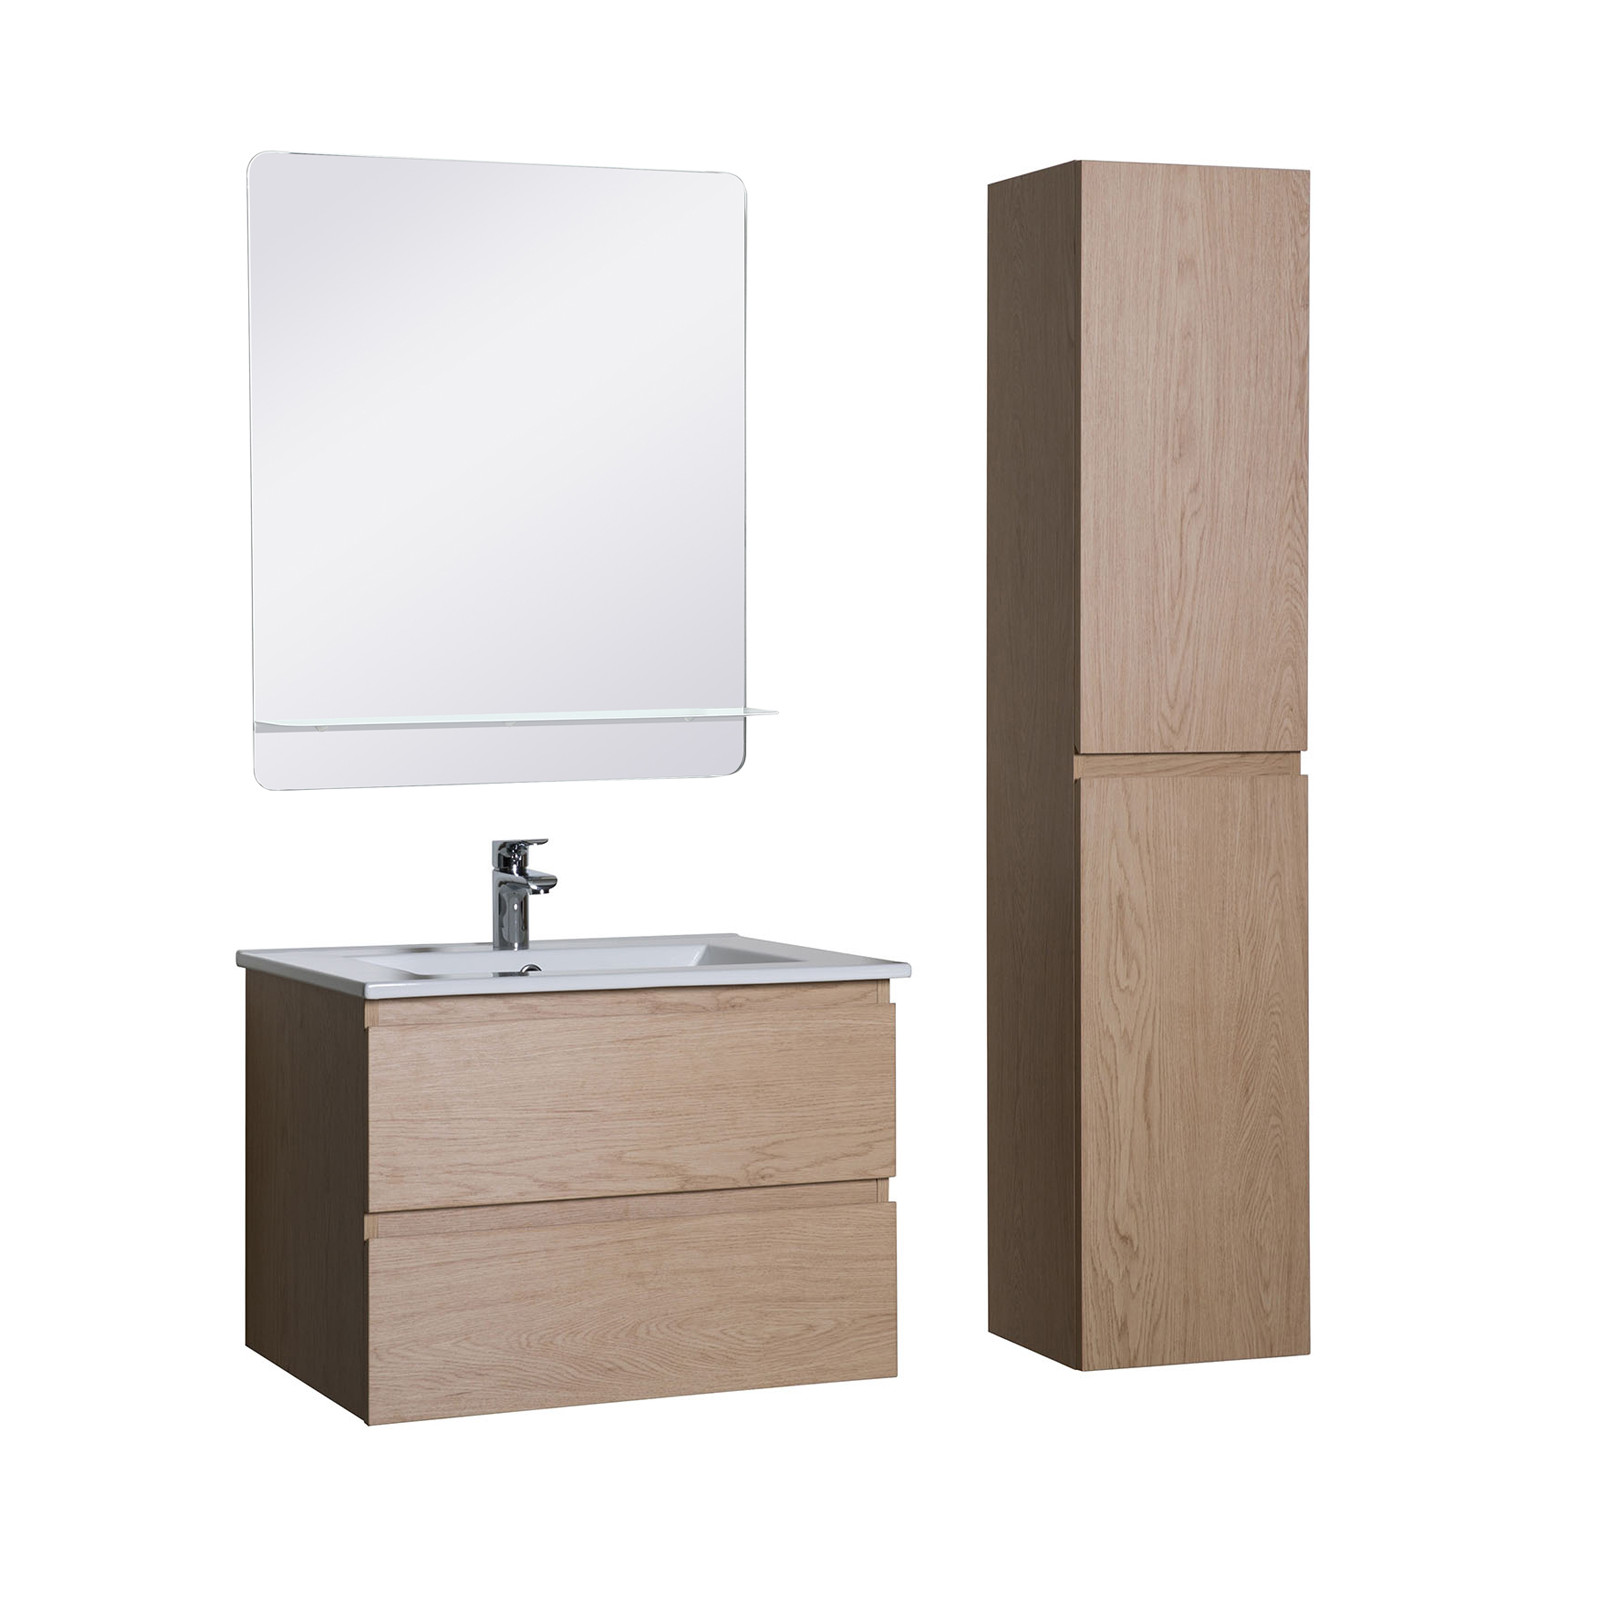 Meuble Salle de Bain 60 cm + Colonne décor Chêne + Miroir SORRENTO